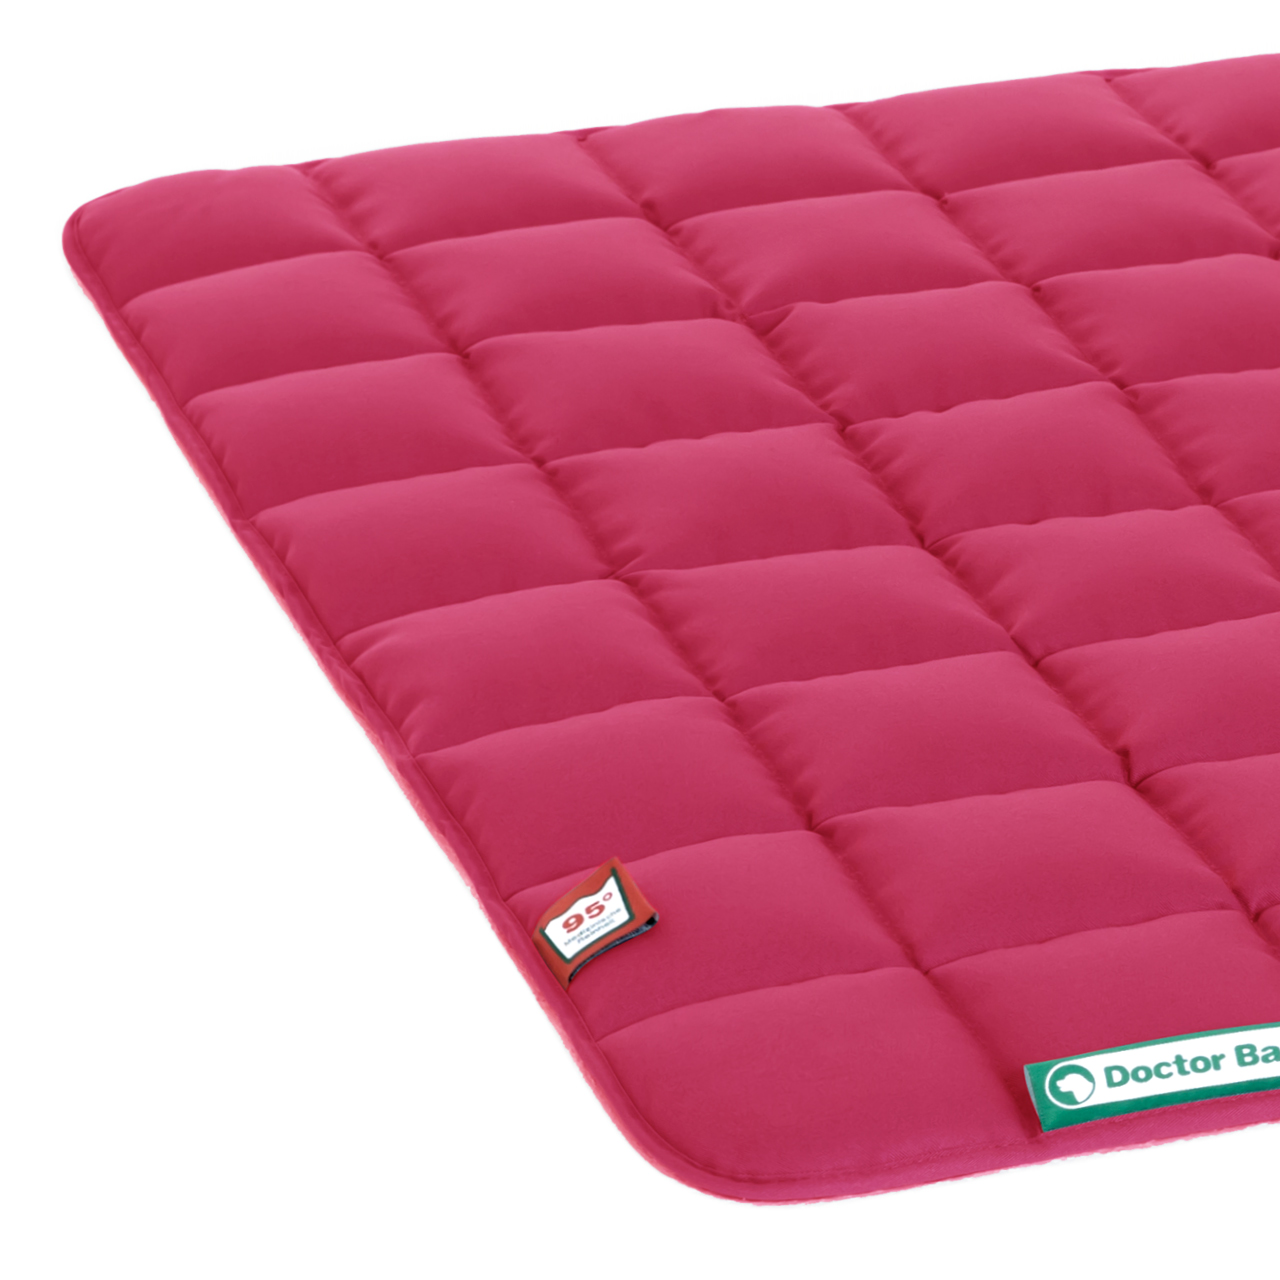 Steppdecke hot pink L